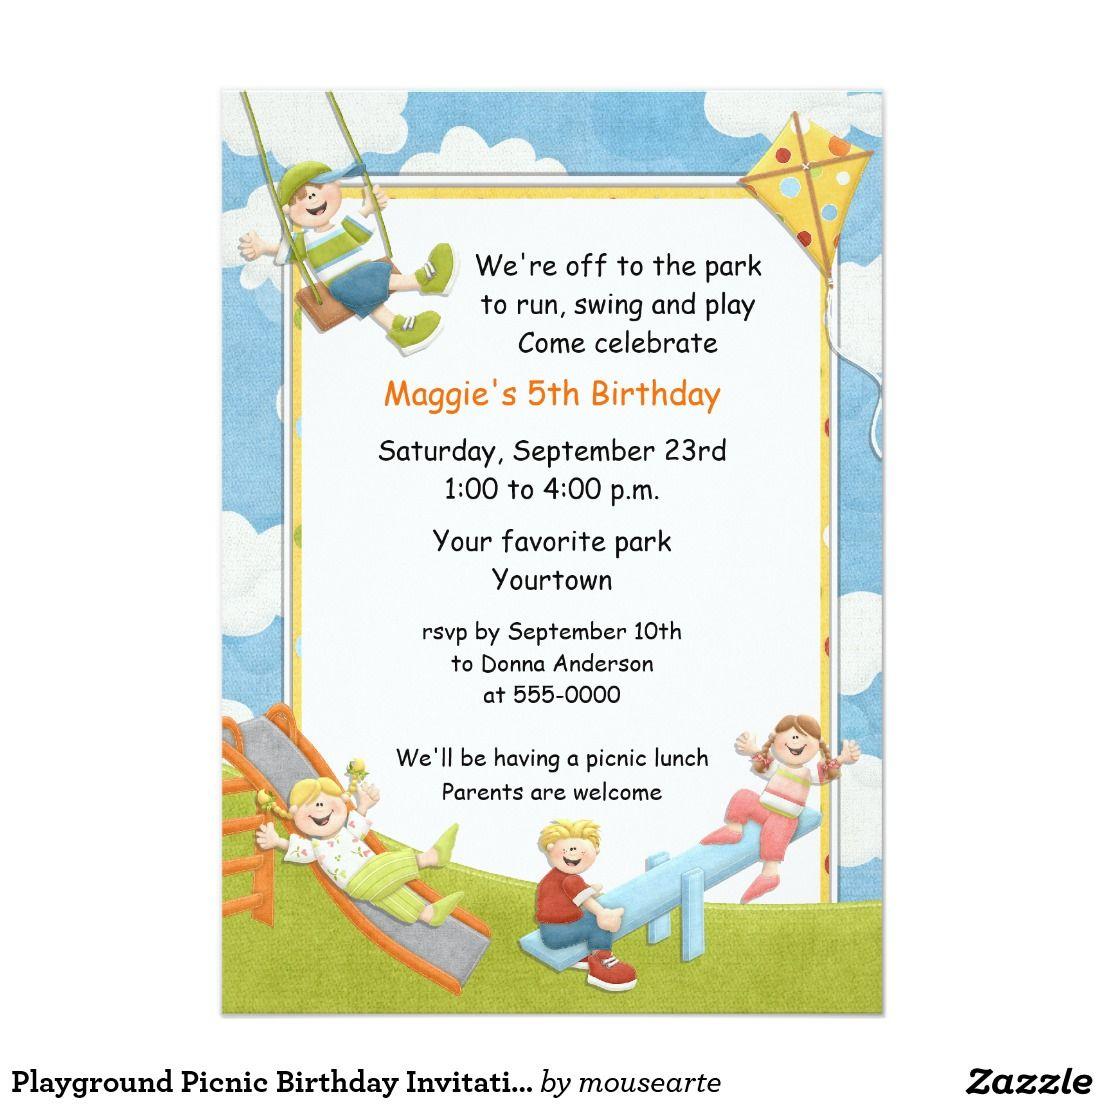 Playground picnic birthday invitation invitations pinterest playground picnic birthday invitation filmwisefo